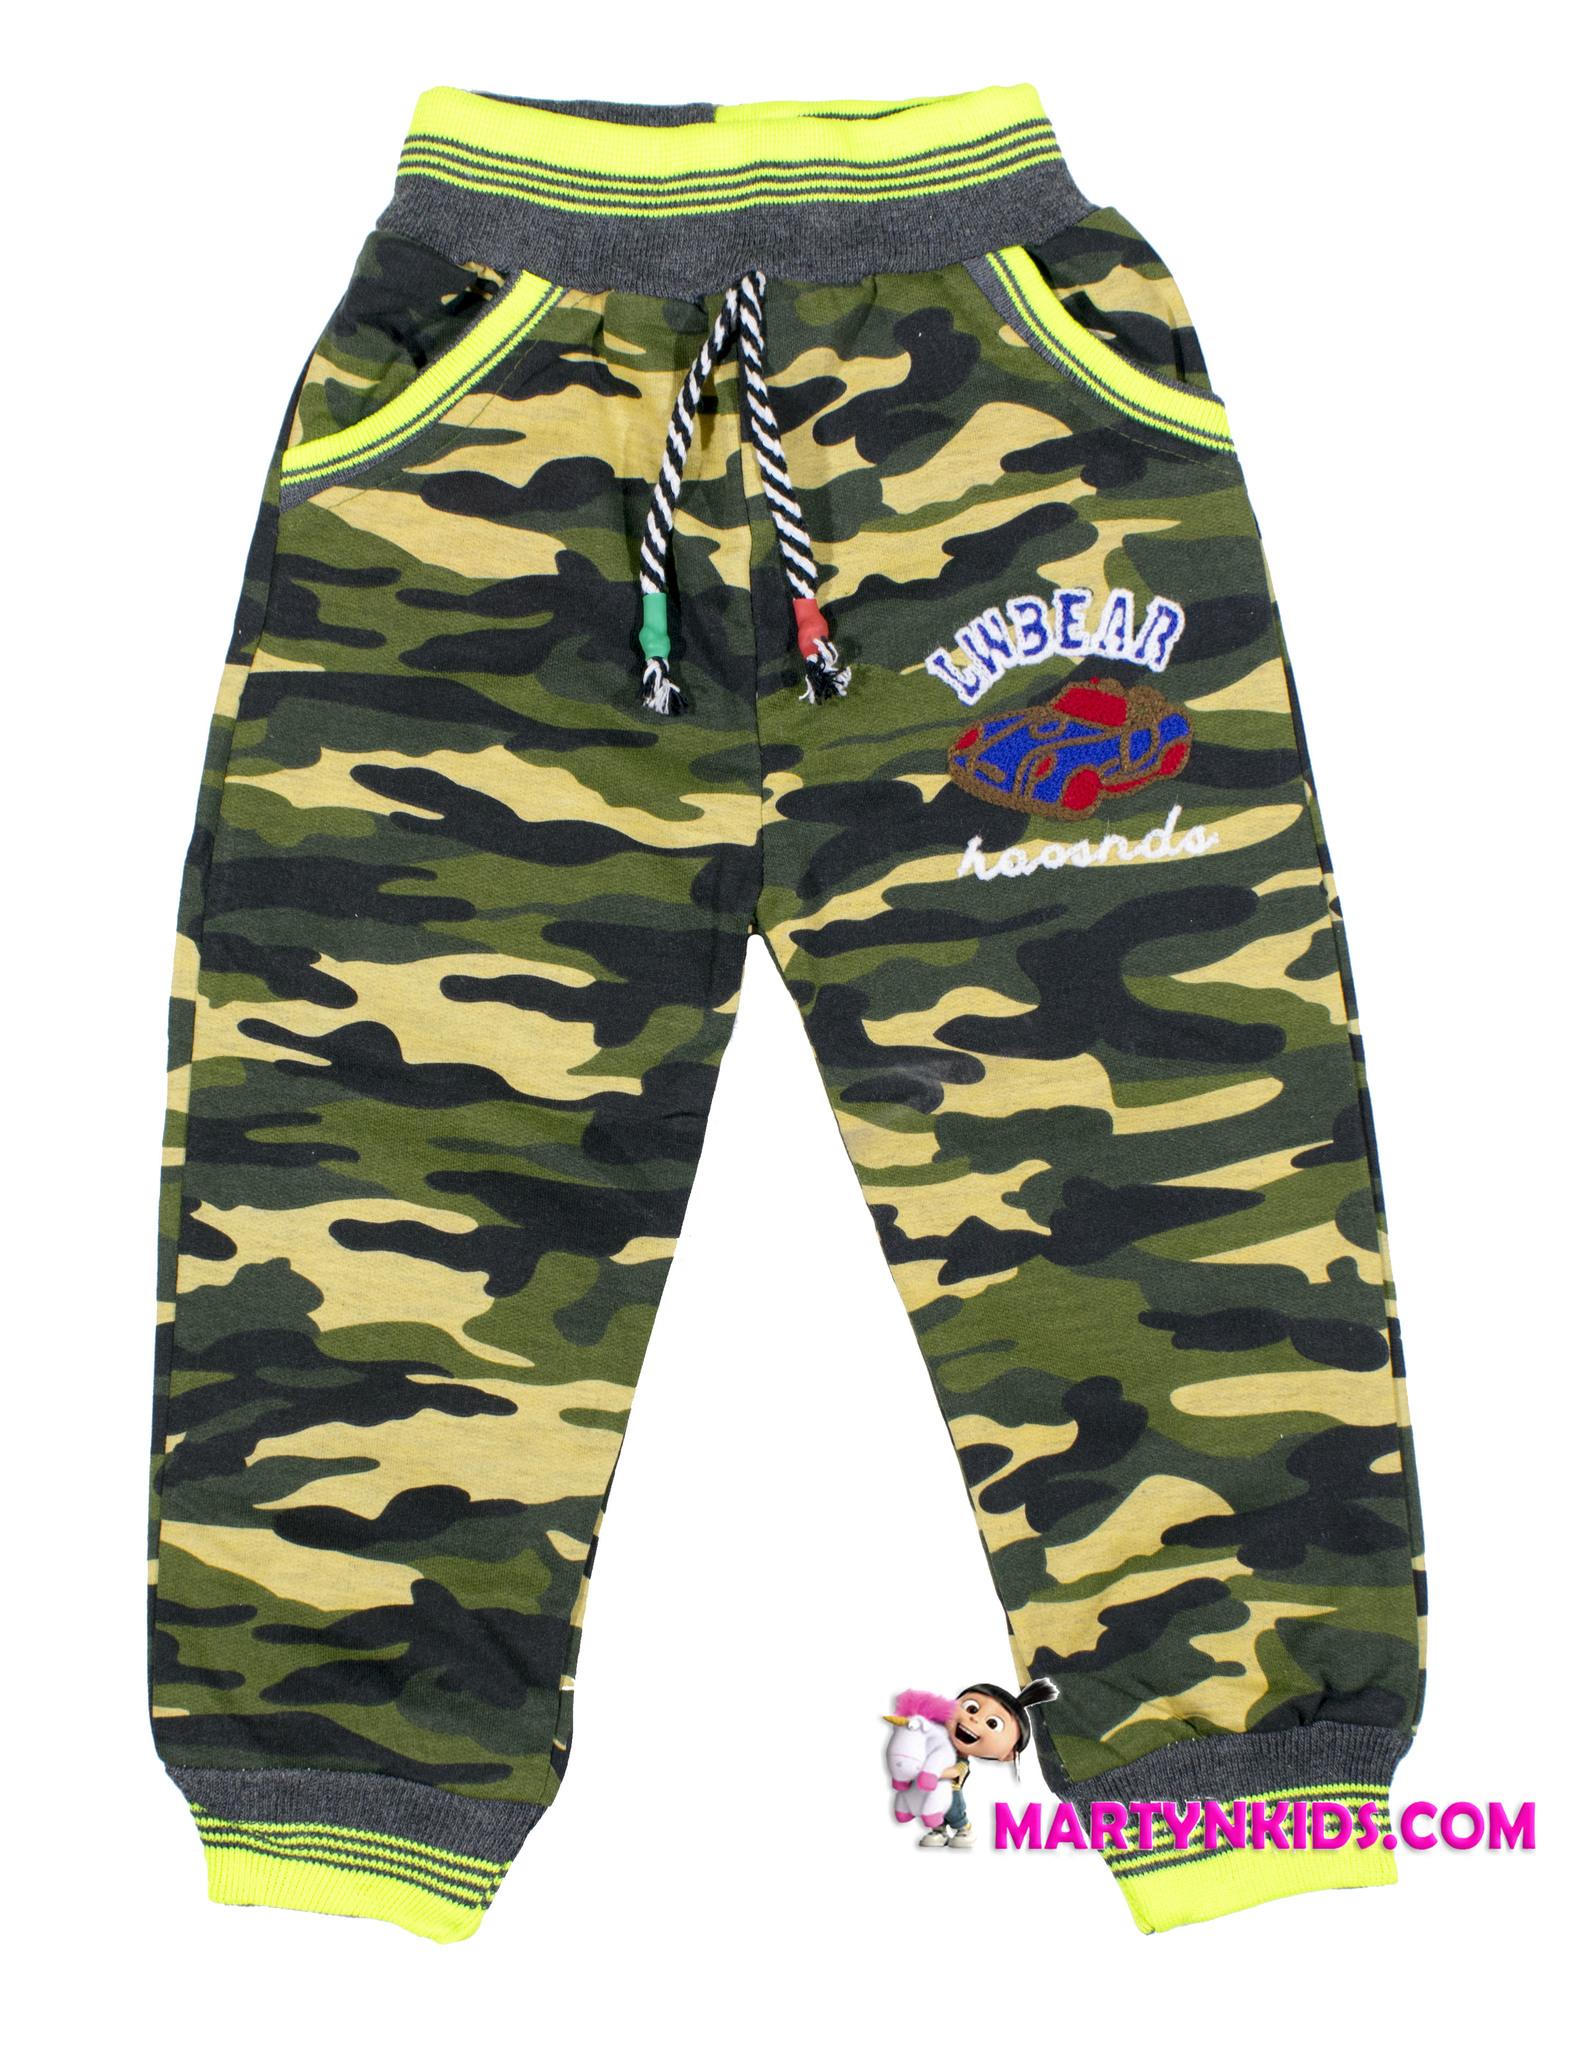 829 штаны машинка хаки